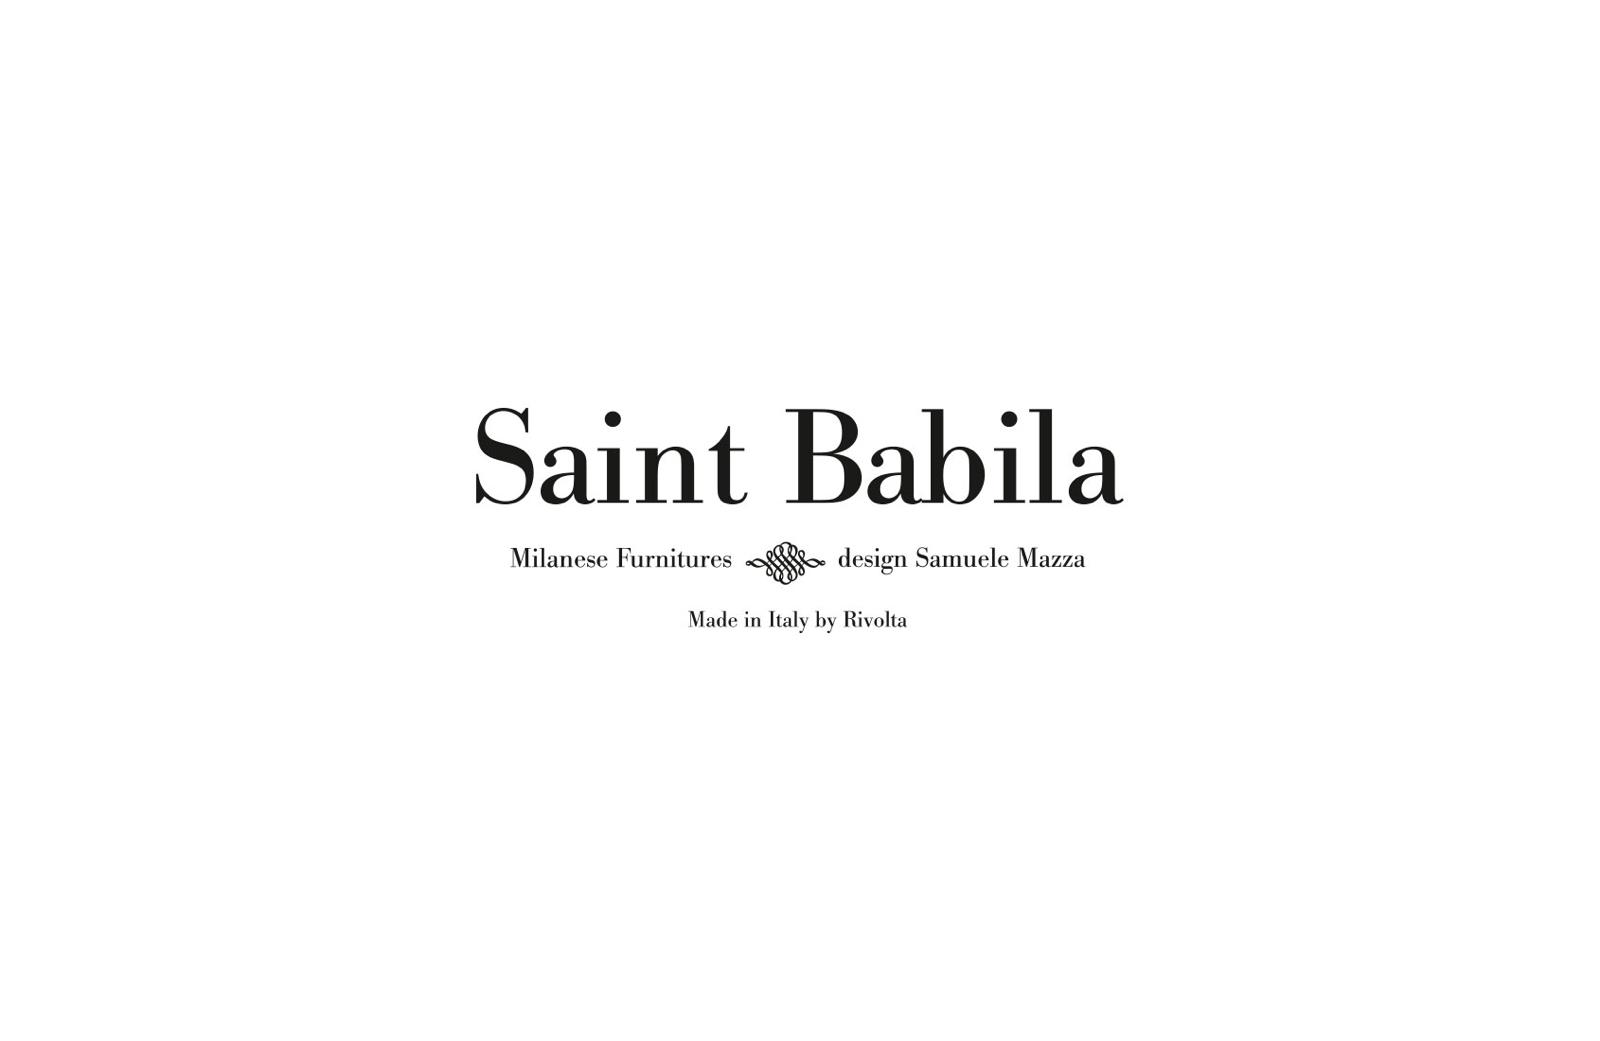 Saint Babila